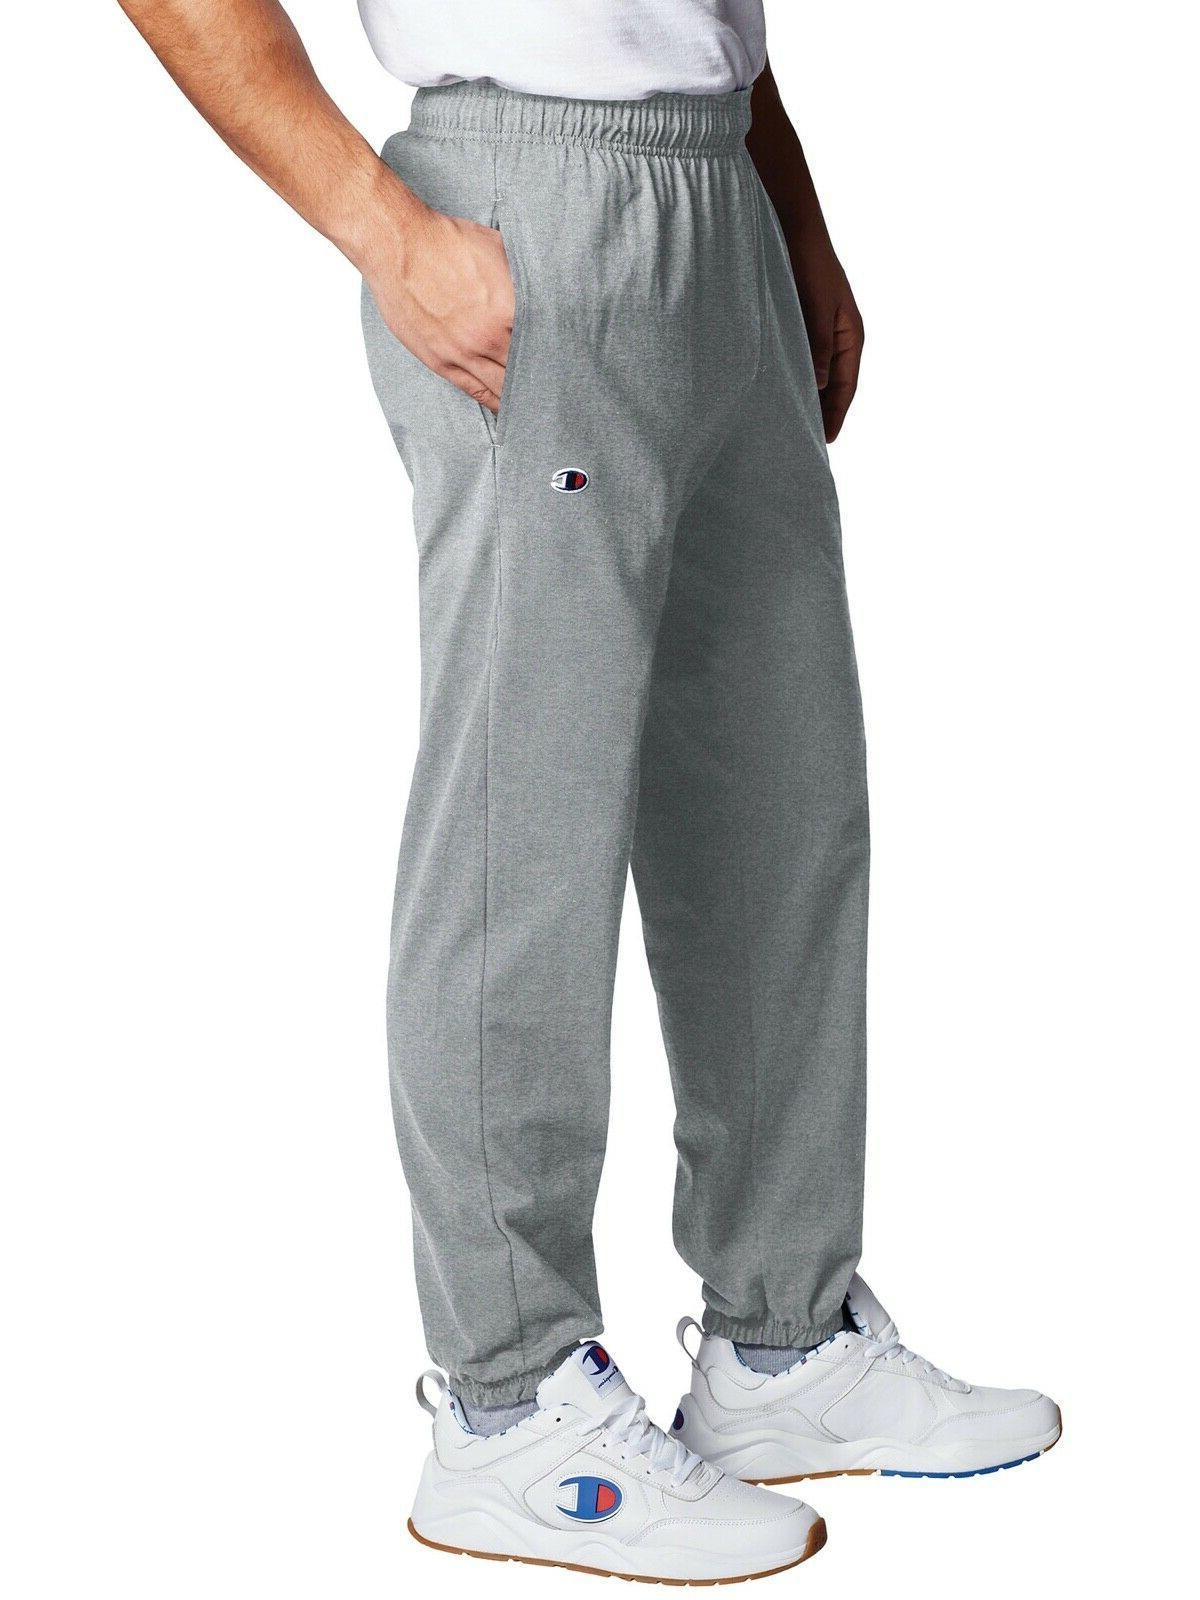 closed bottom light jersey sweatpant